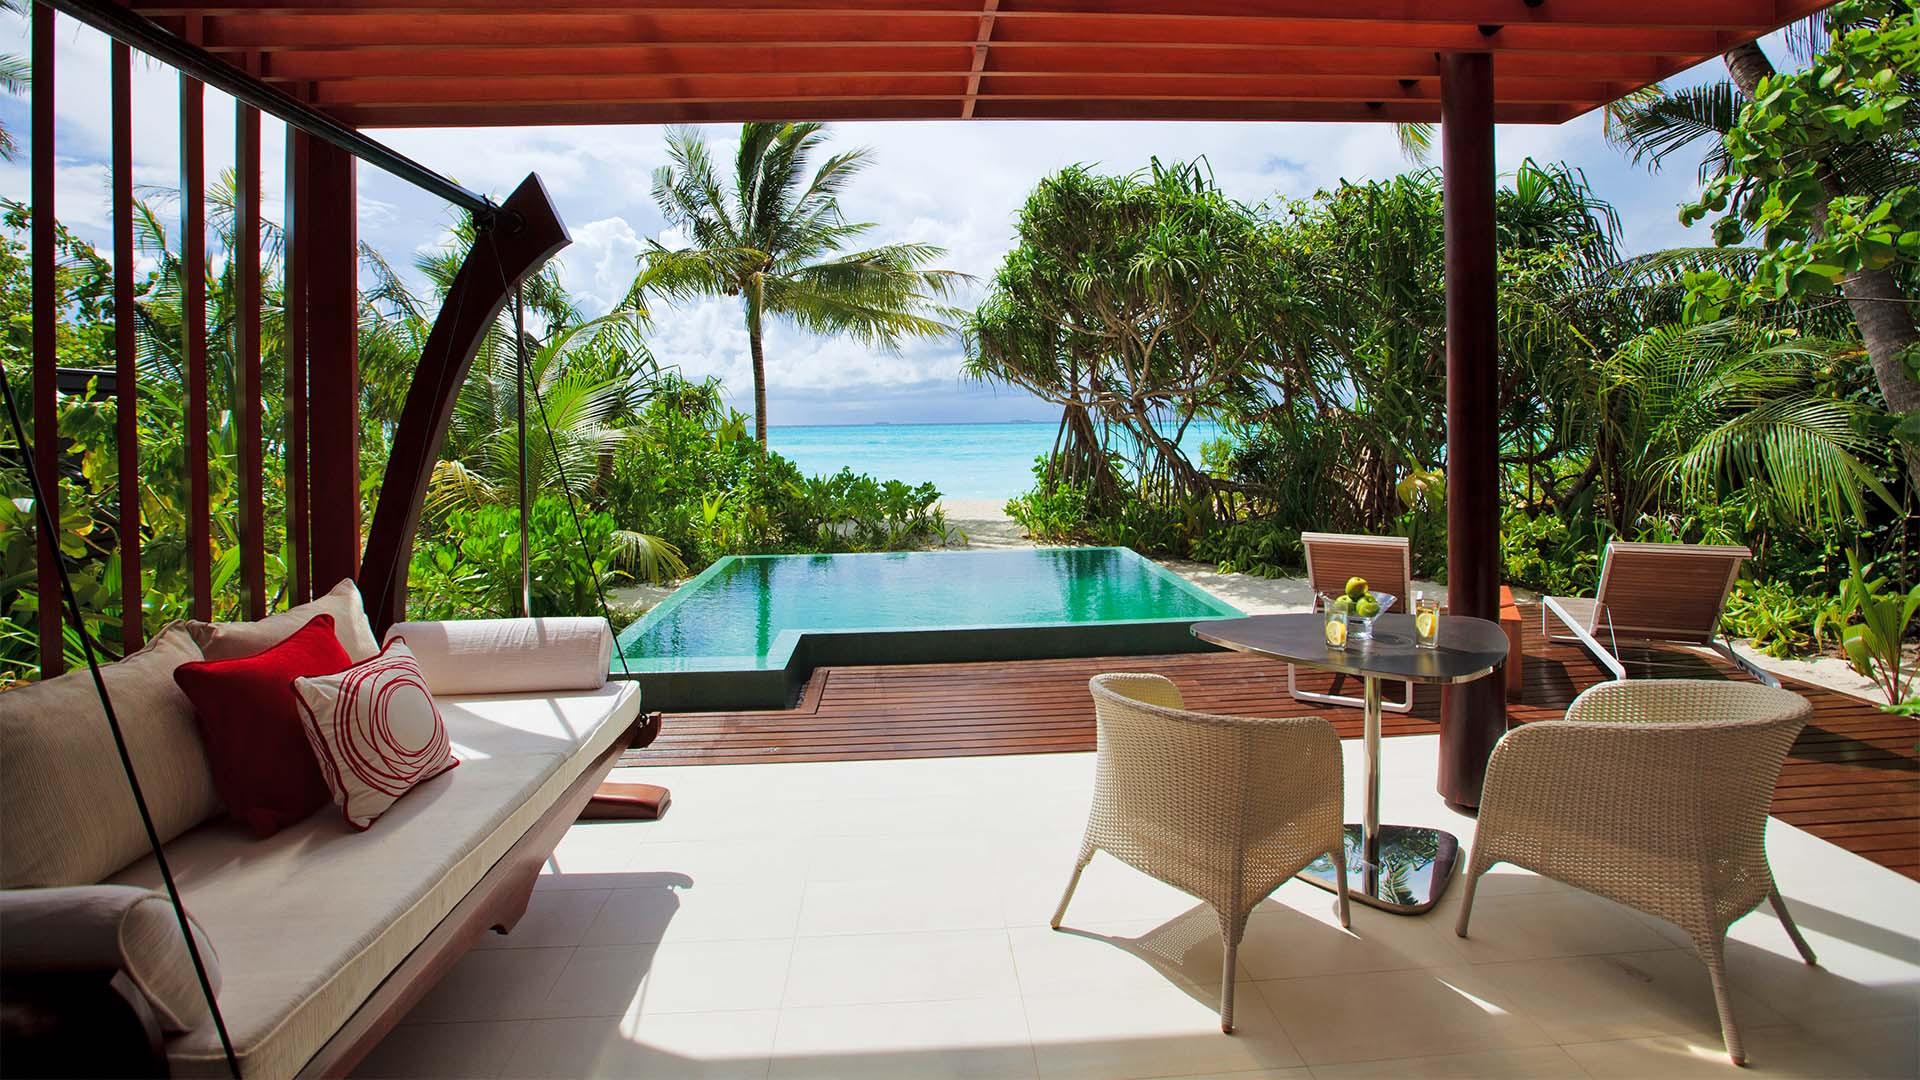 NIYAMA, Maldives, Asia